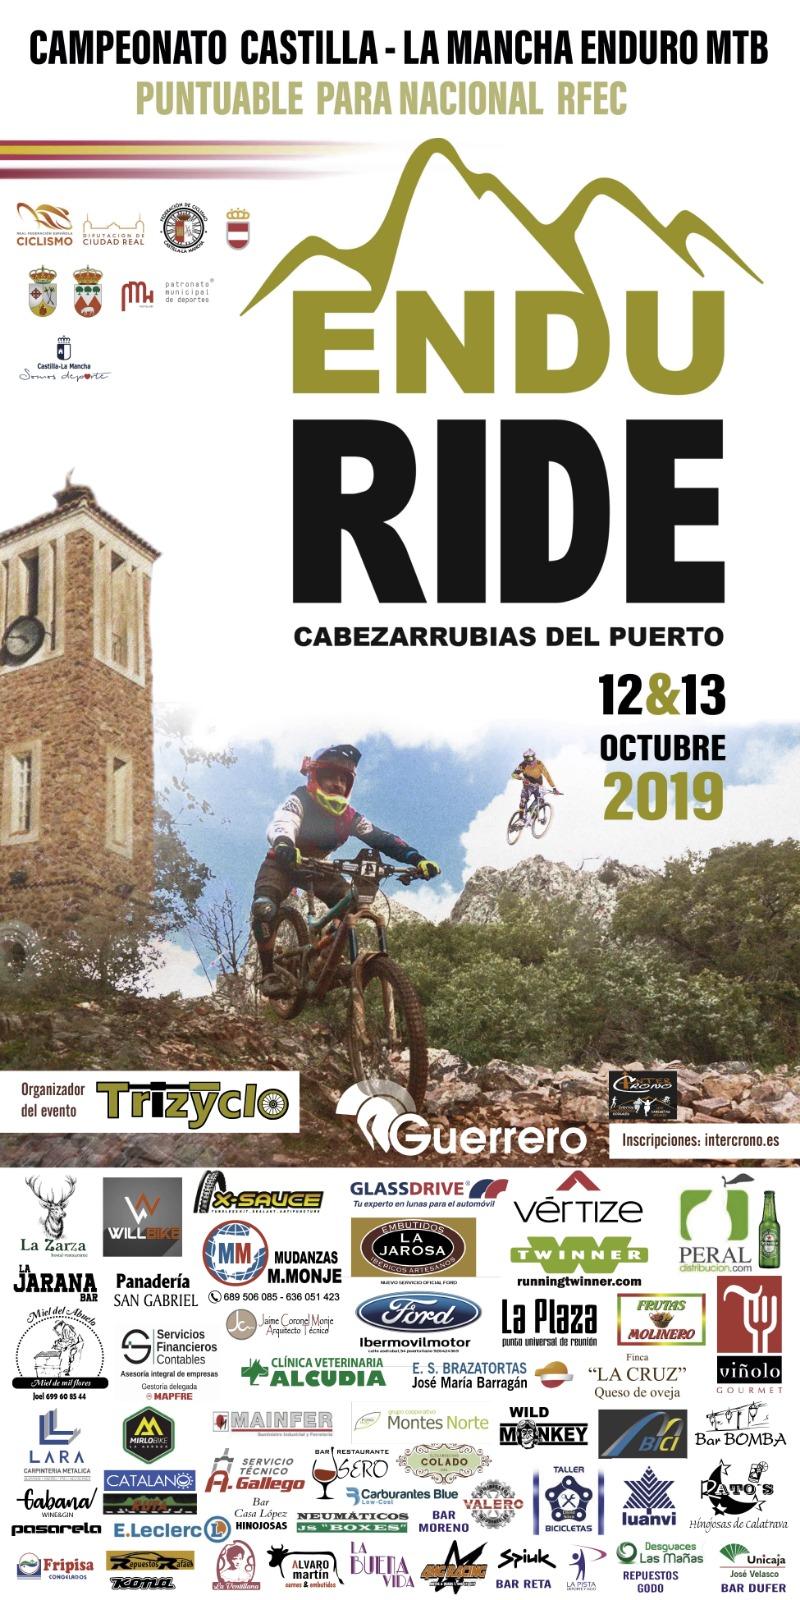 ENDU RIDE - CARRERA ENDURO CAMPEONATO CASTILLA LA MANCHA